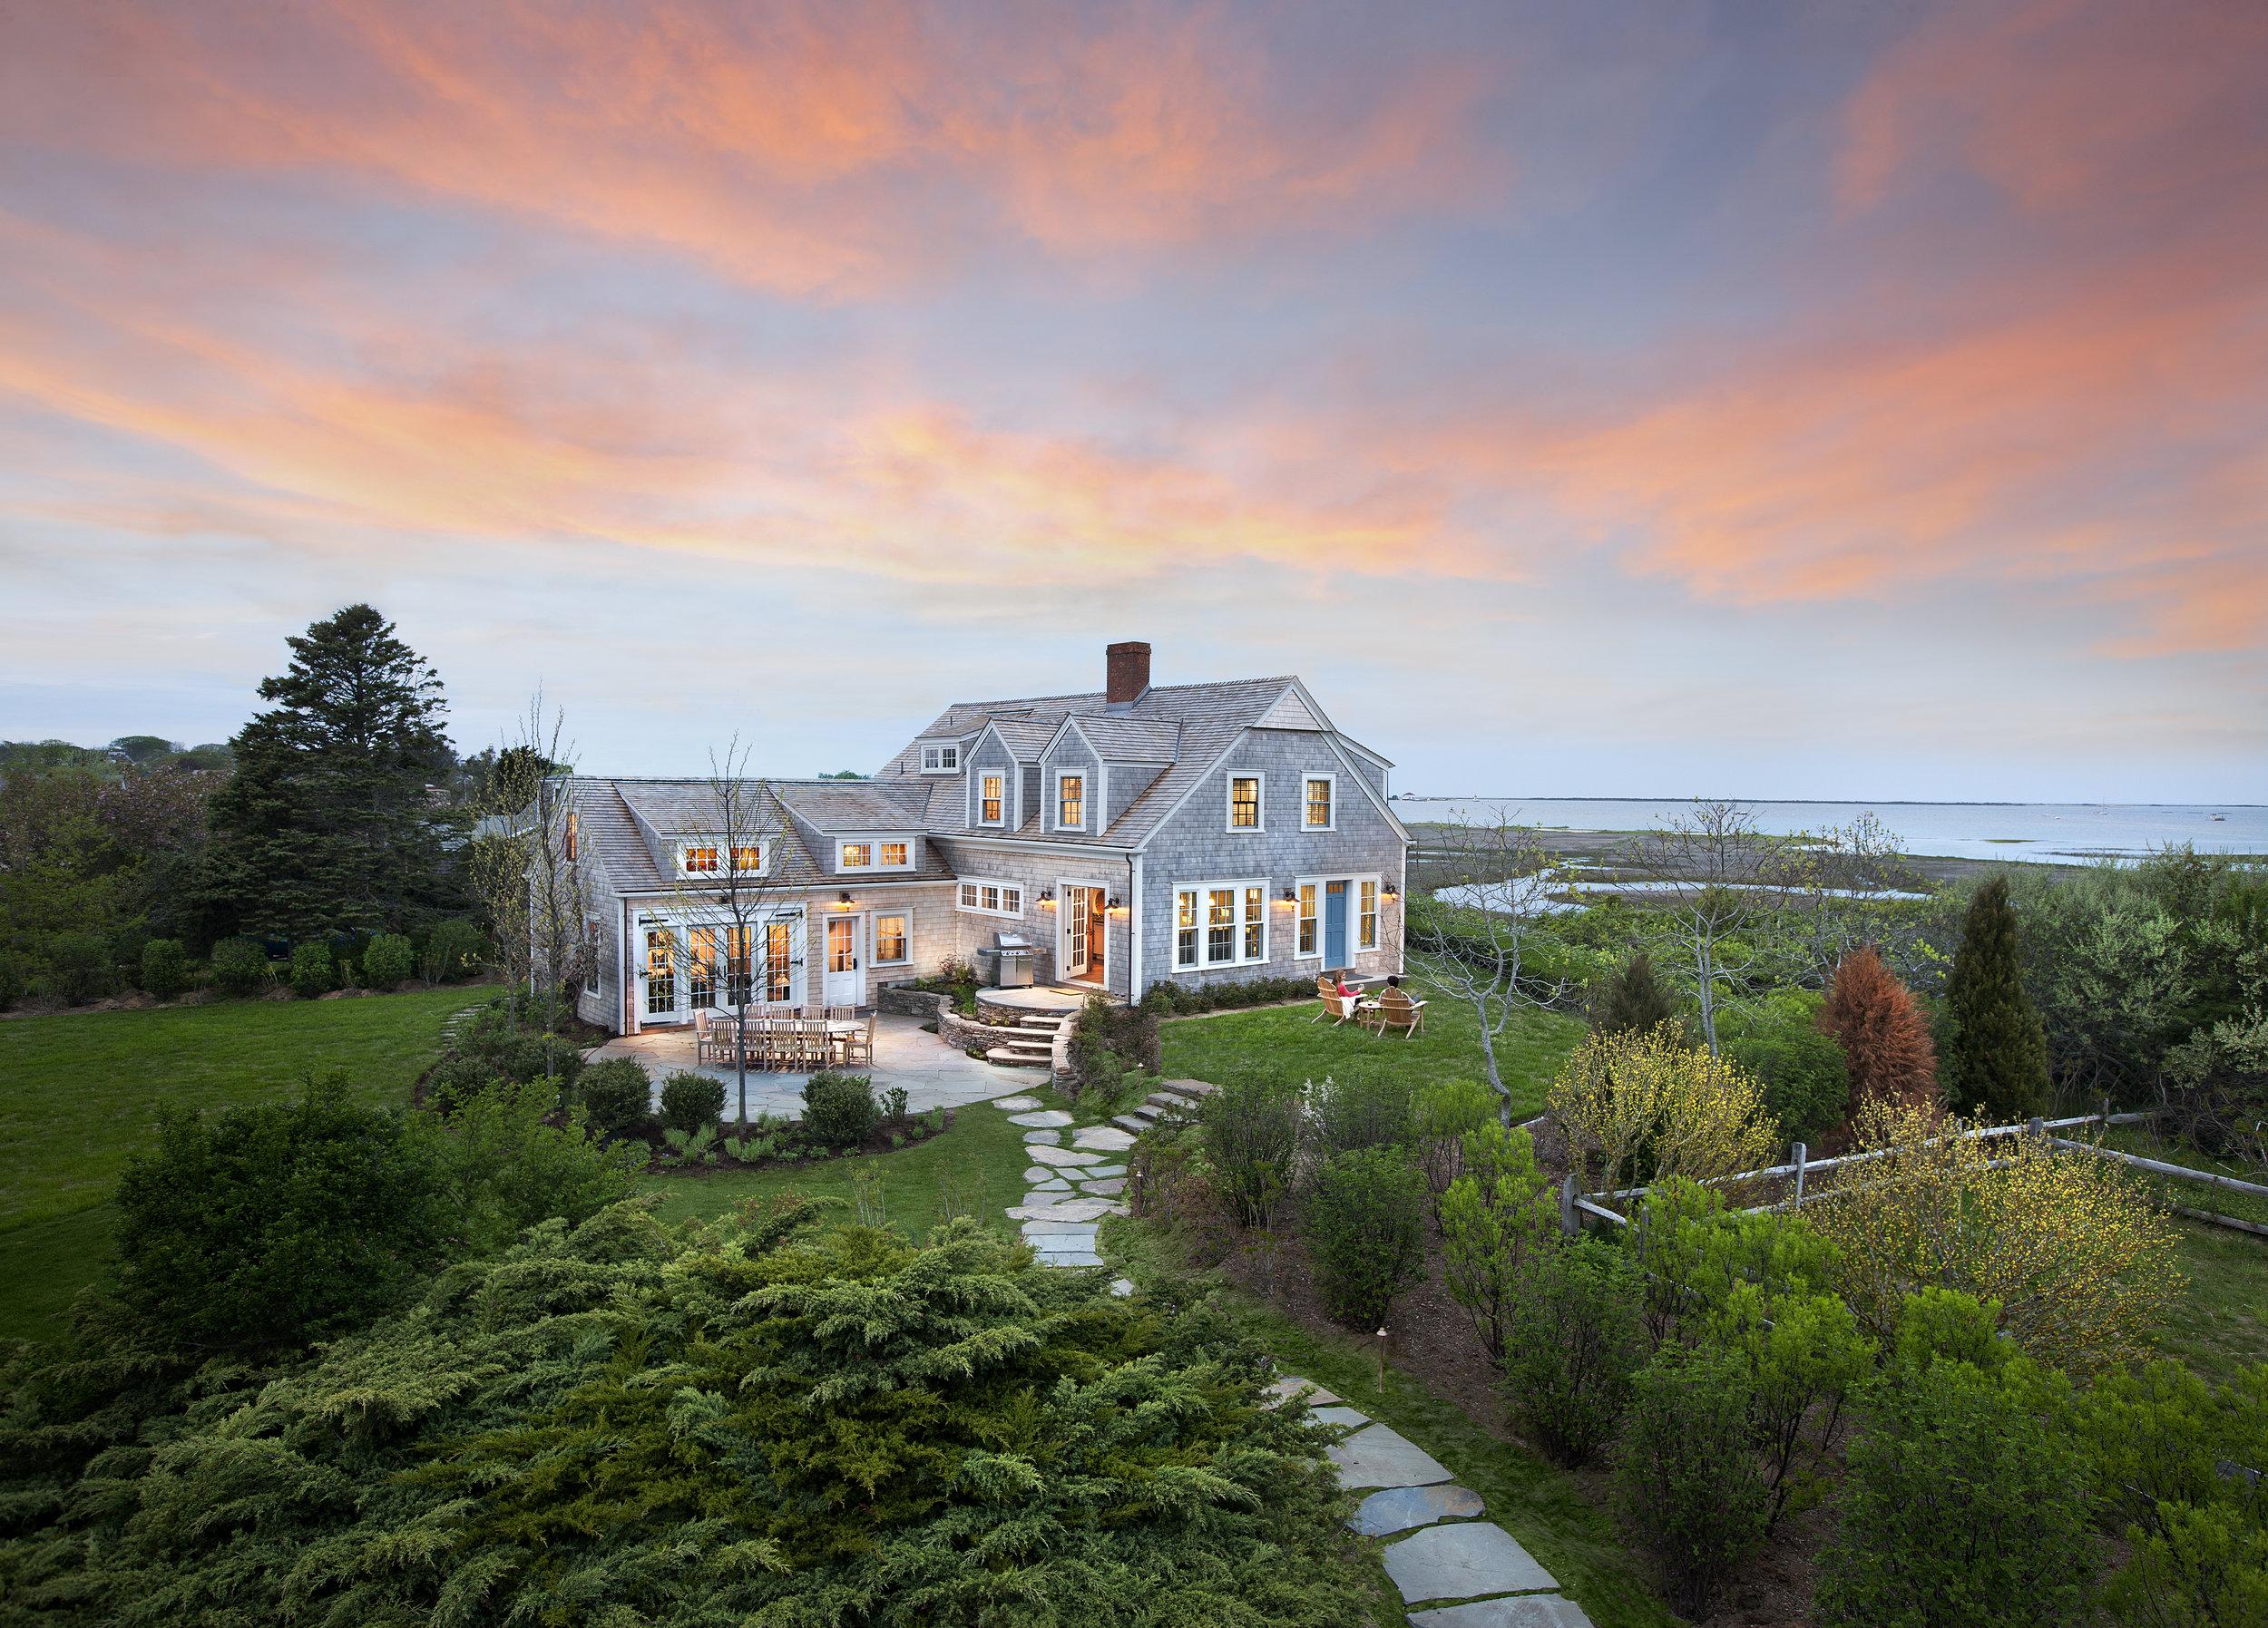 Inspirato_Destination_Nantucket_Residence_Shearwater.jpg